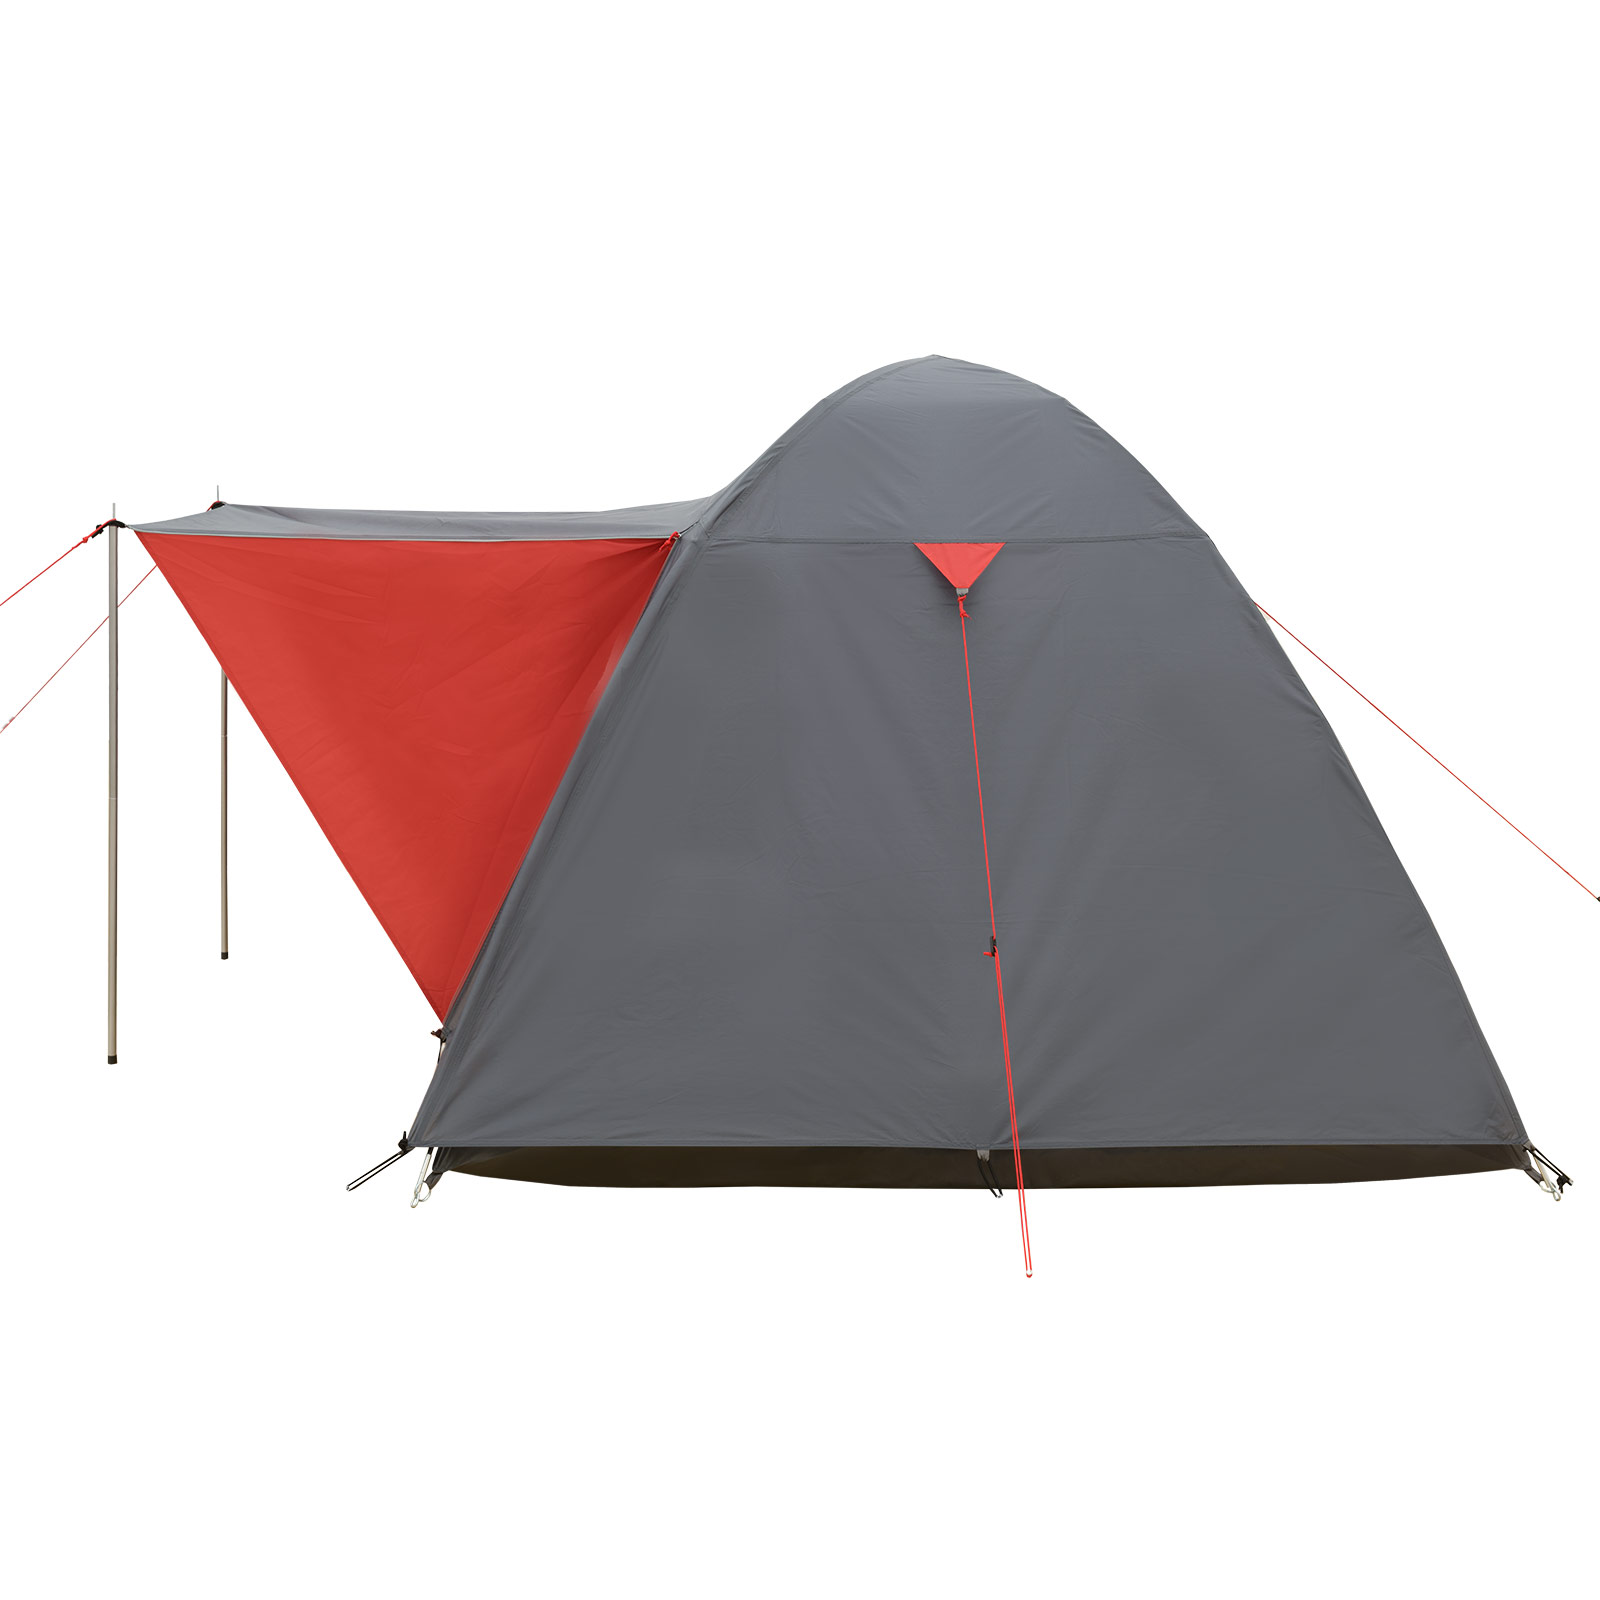 Zelt Mit Himmelblick : Justcamp austin campingzelt personen kuppelzelt iglu